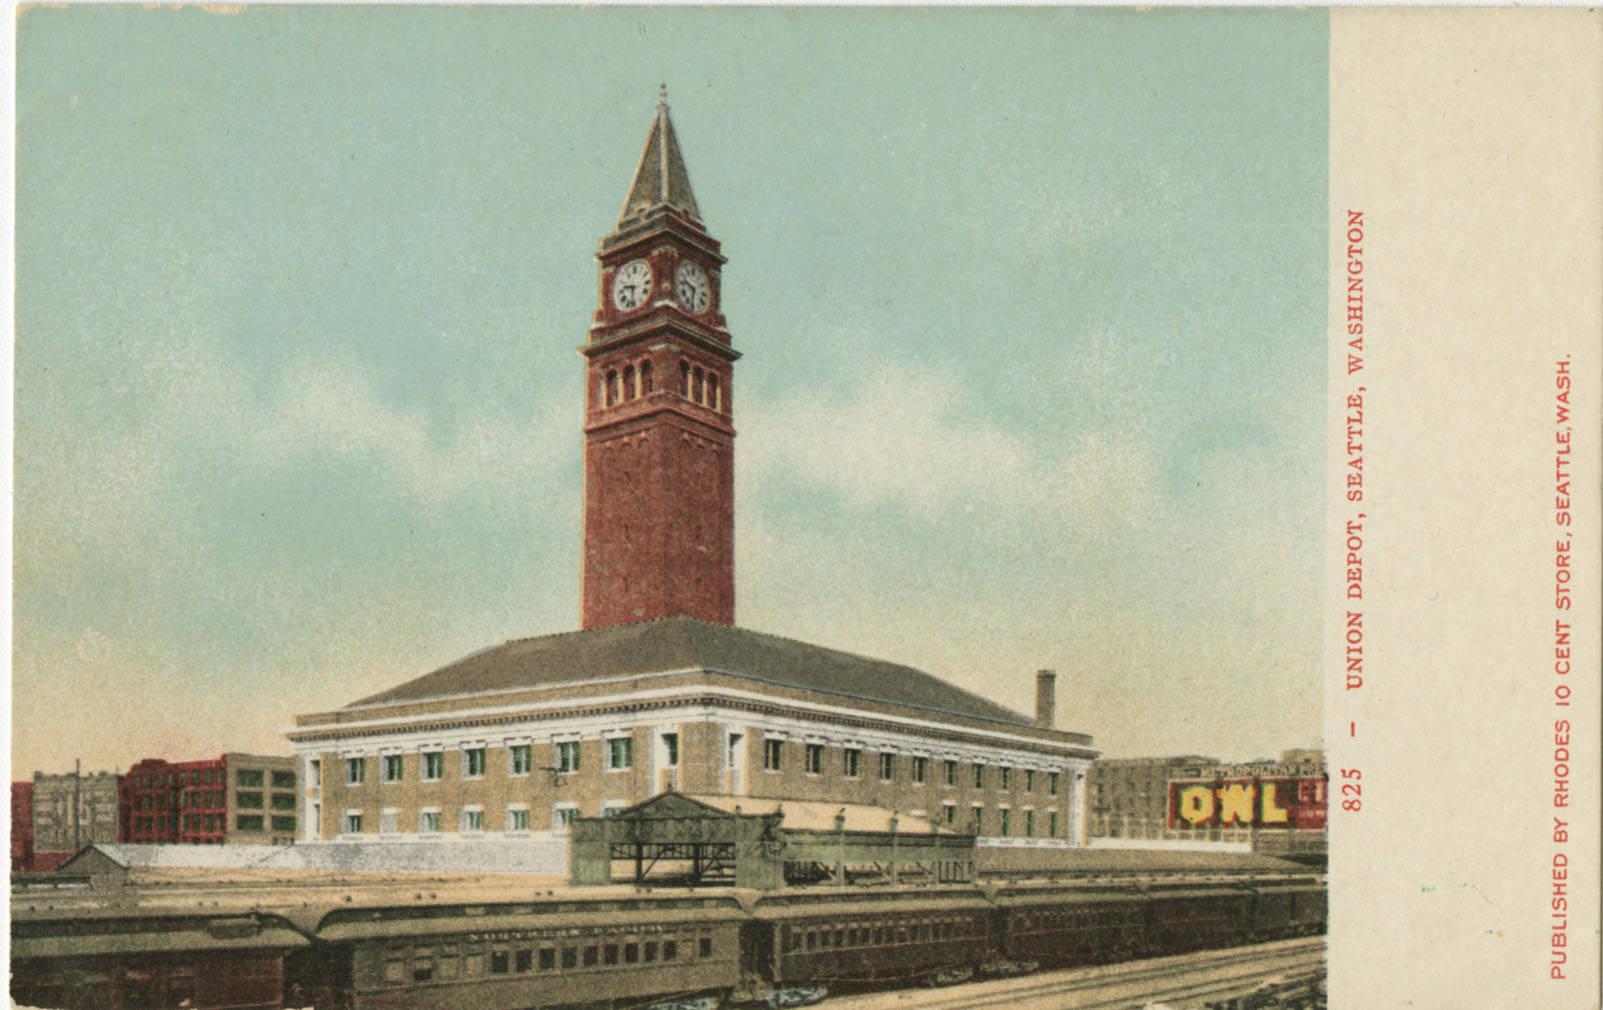 King Street Station, ca. 1906